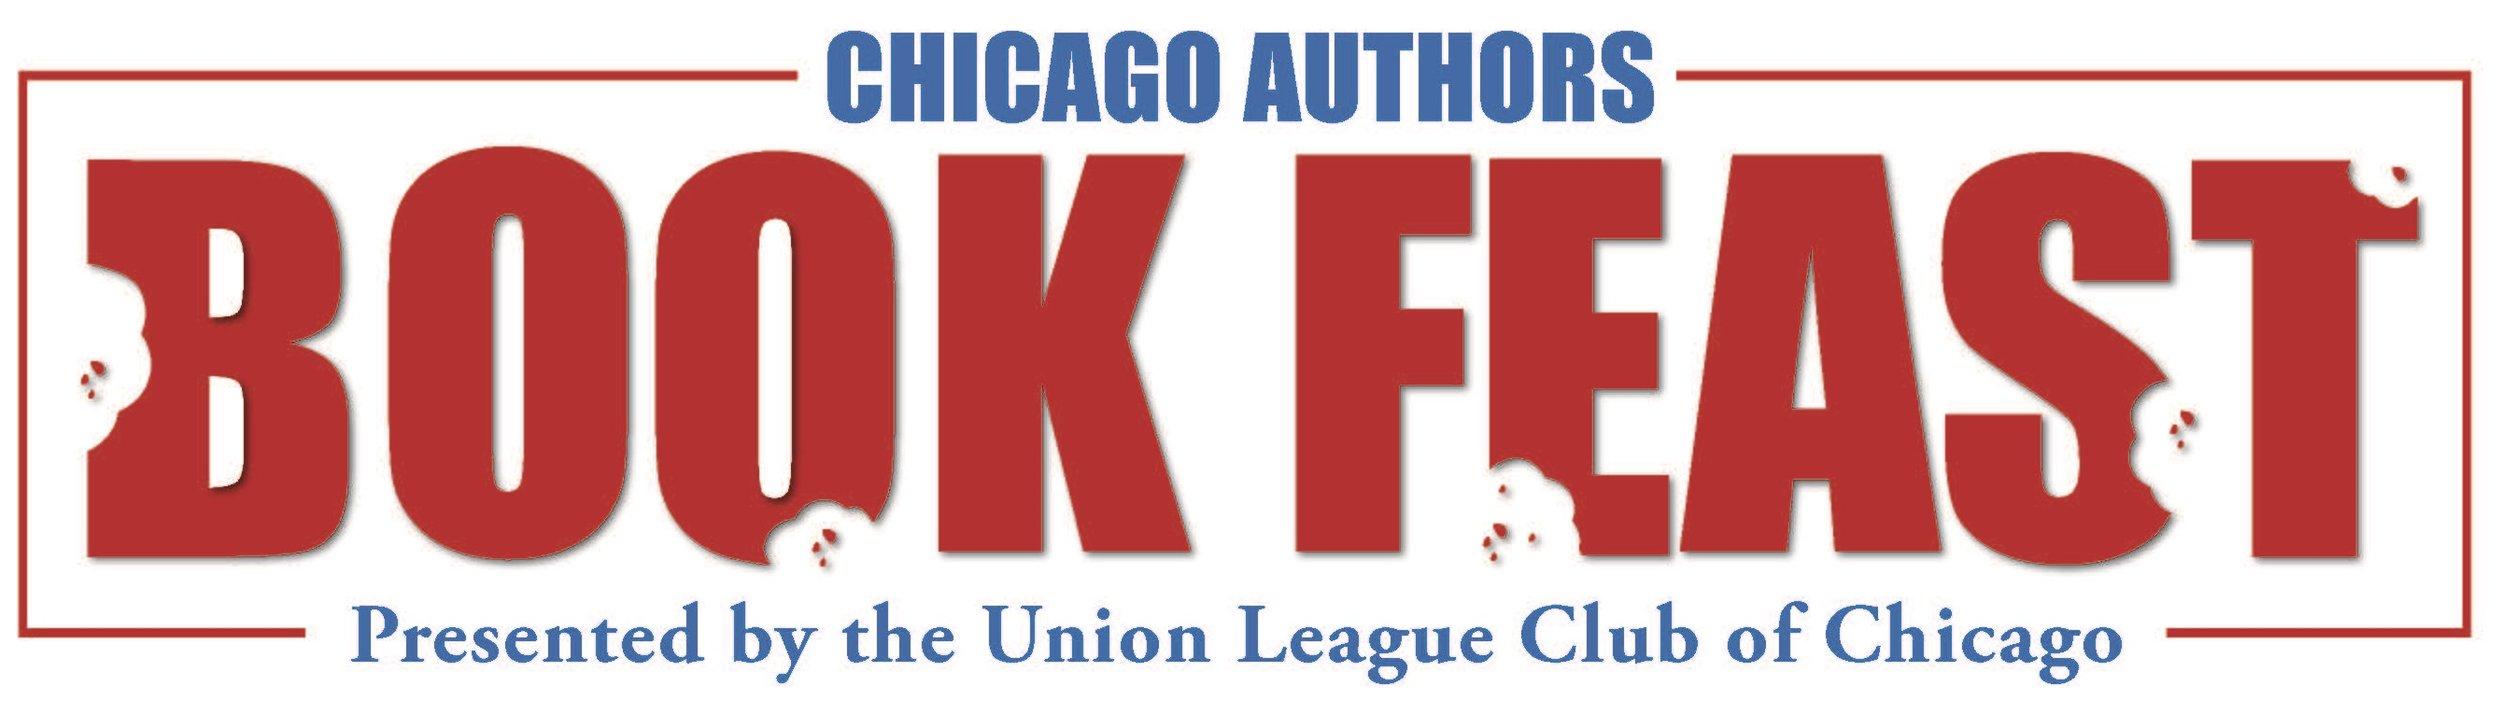 ULC Chicago Authors Book Feast